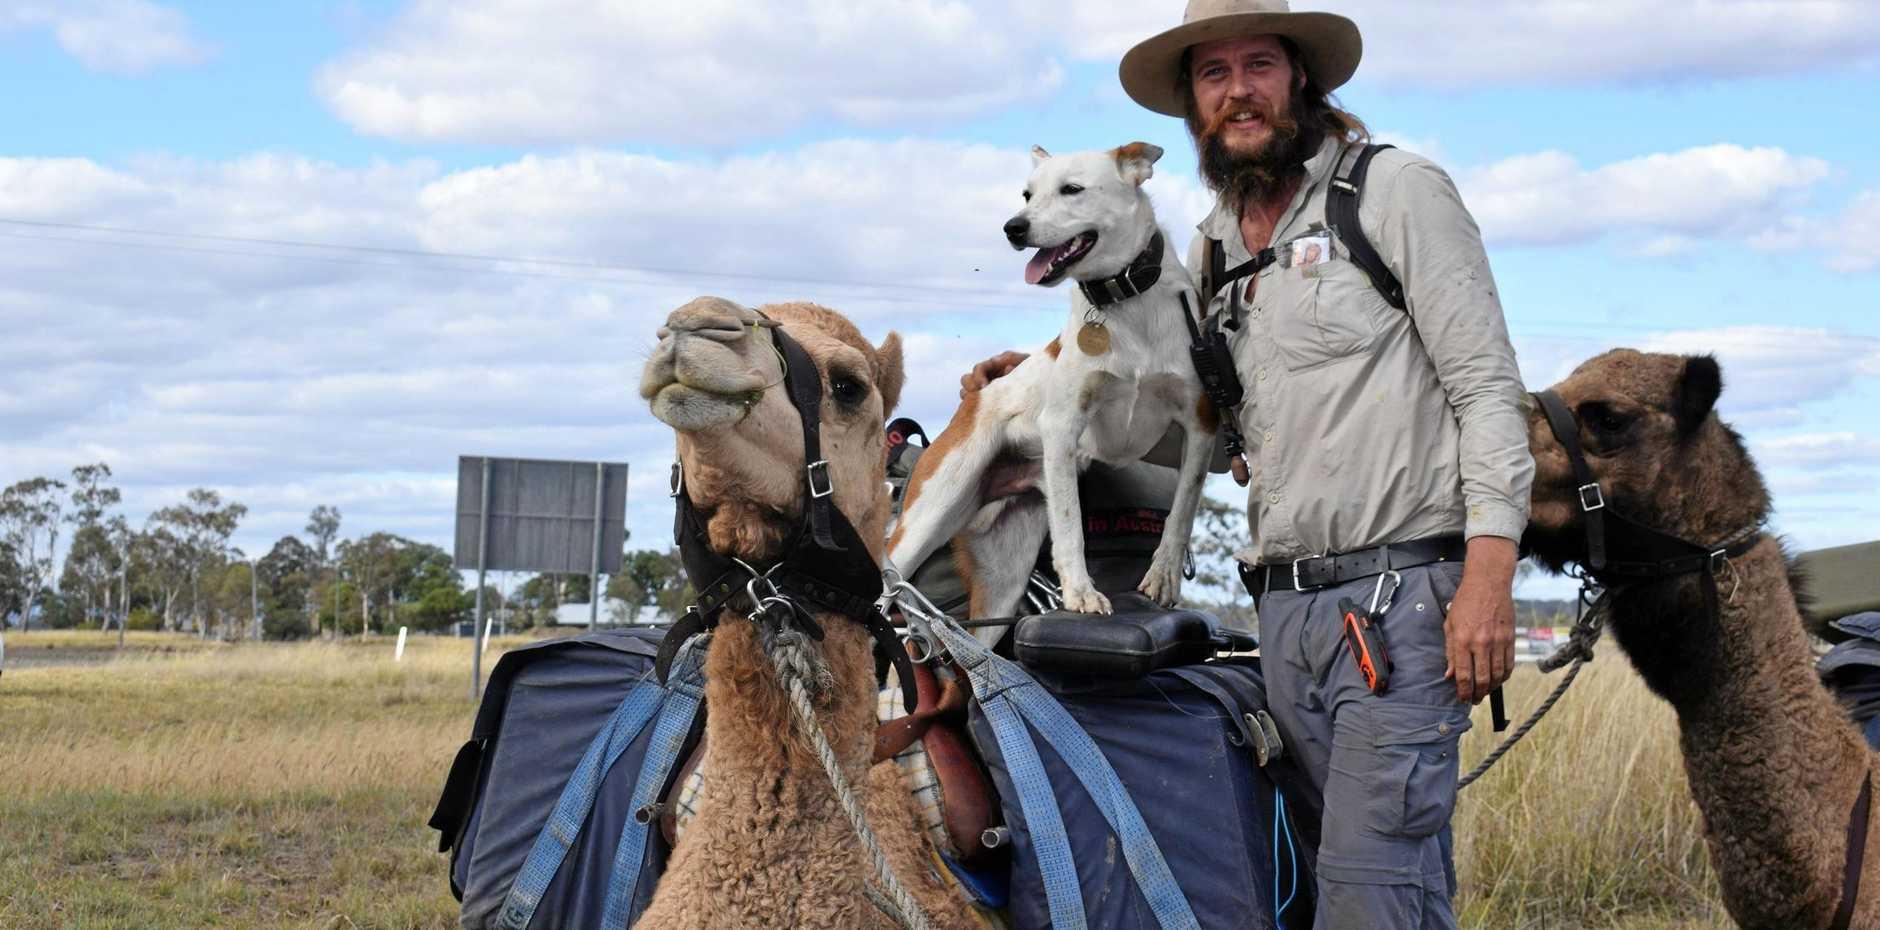 John Elliott with dog Bruski and camels Ted, Jackson, Arthur and Bill